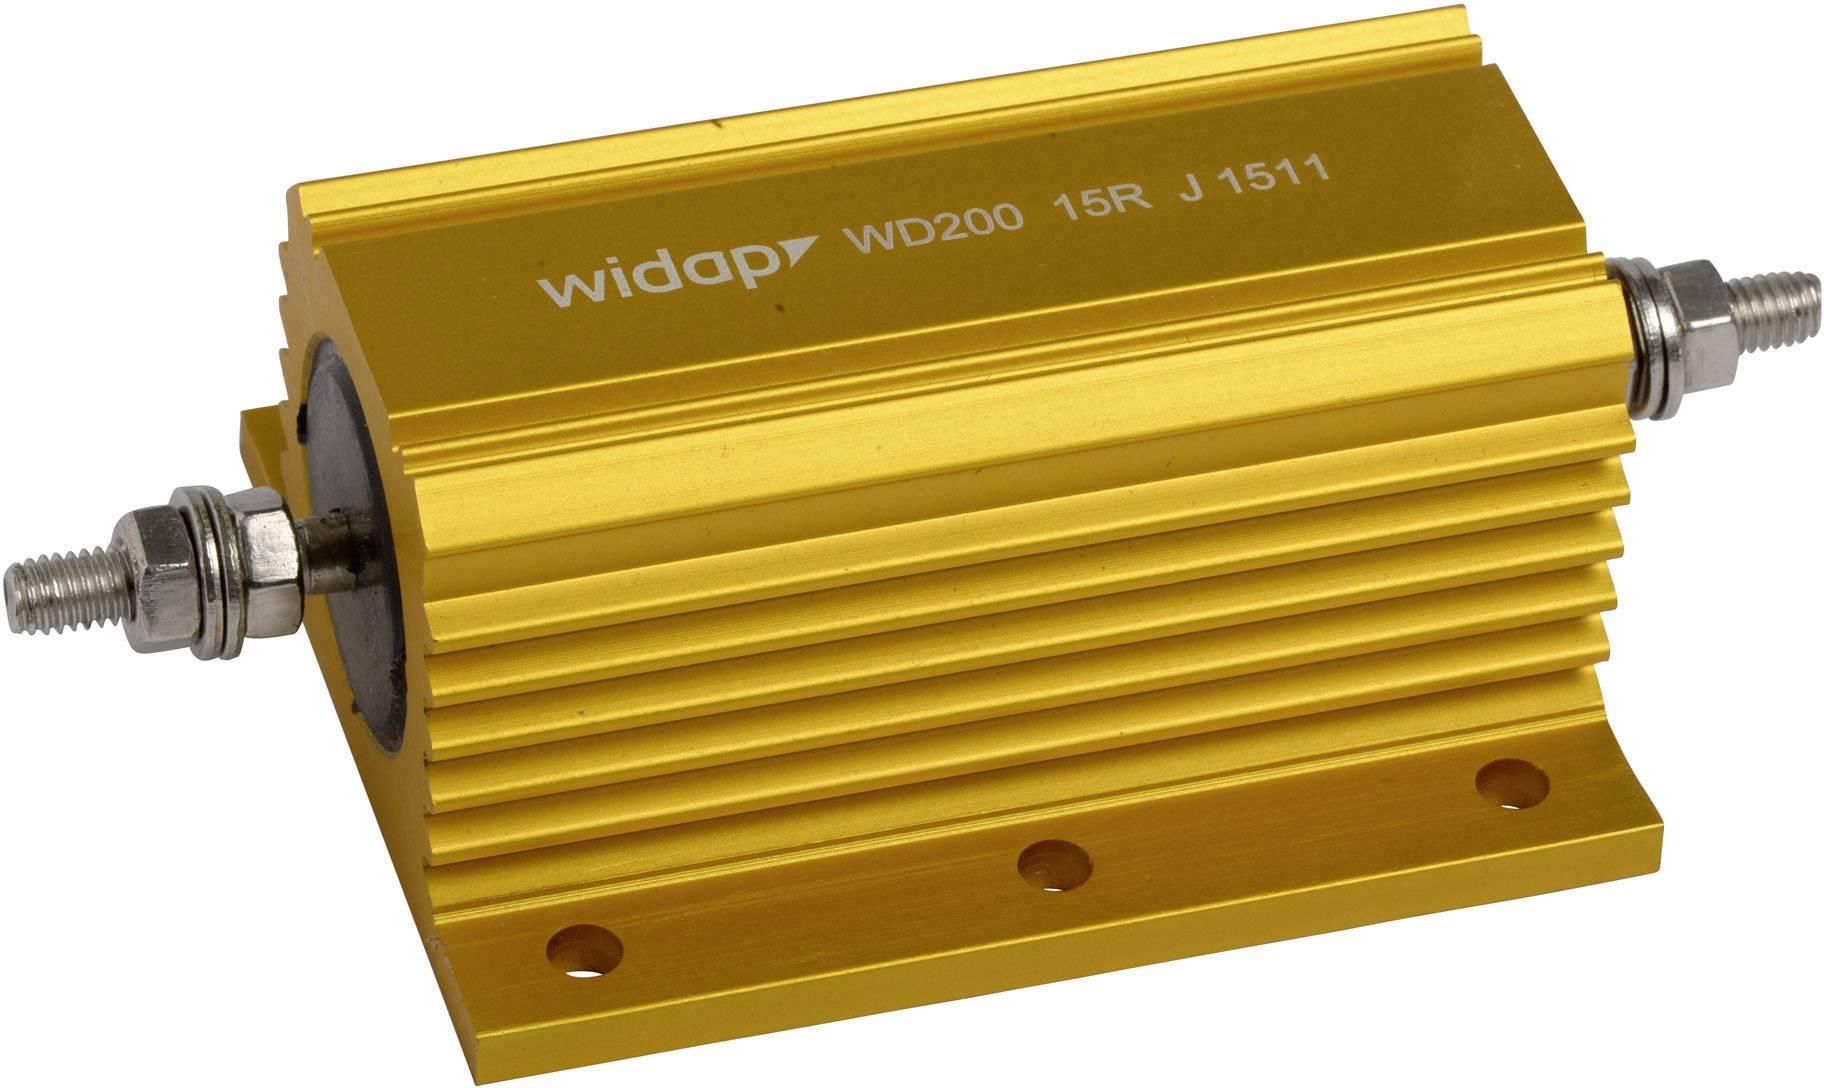 Drôtový rezistor Widap 160158, hodnota odporu 220 Ohm, 200 W, 1 ks